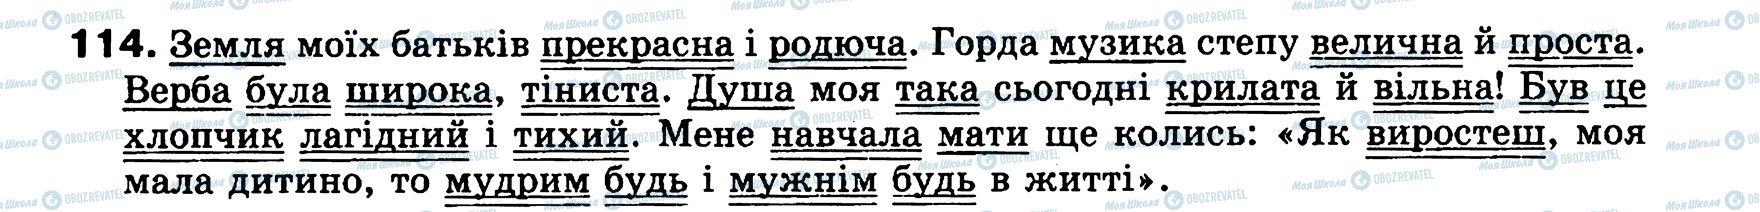 ГДЗ Укр мова 8 класс страница 114